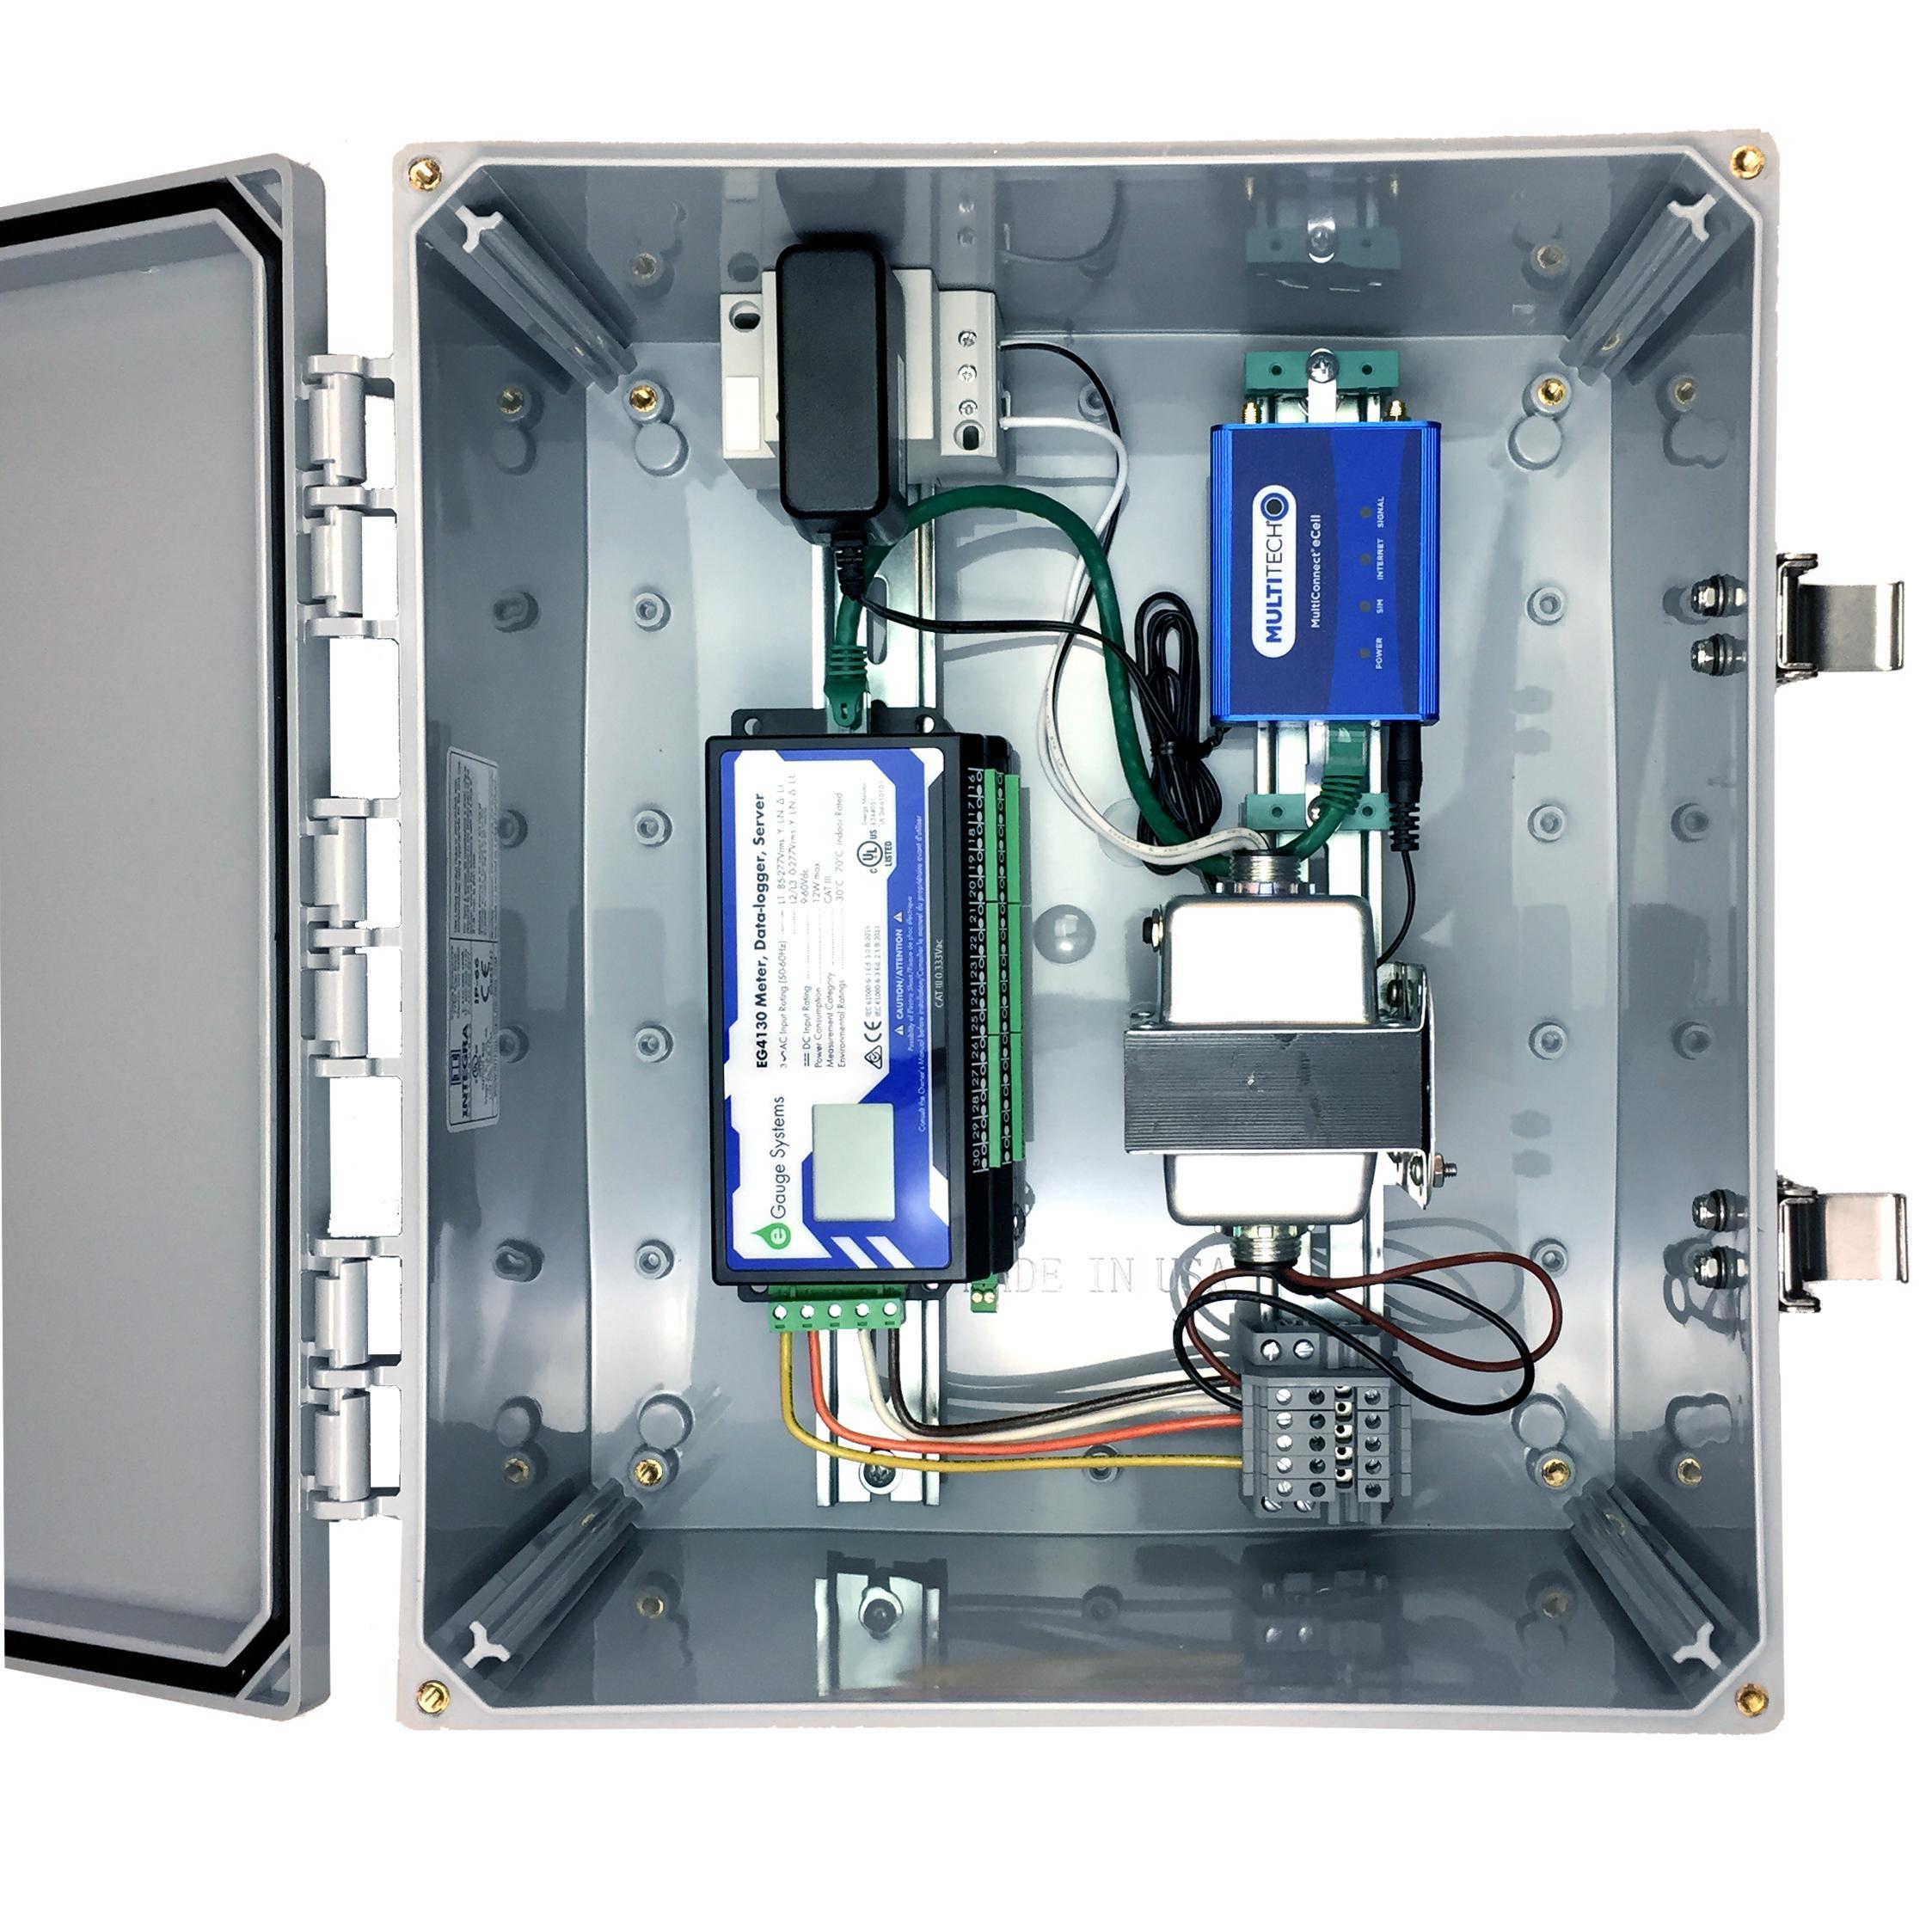 powered_enclosure_kit_277-pek277.jpg